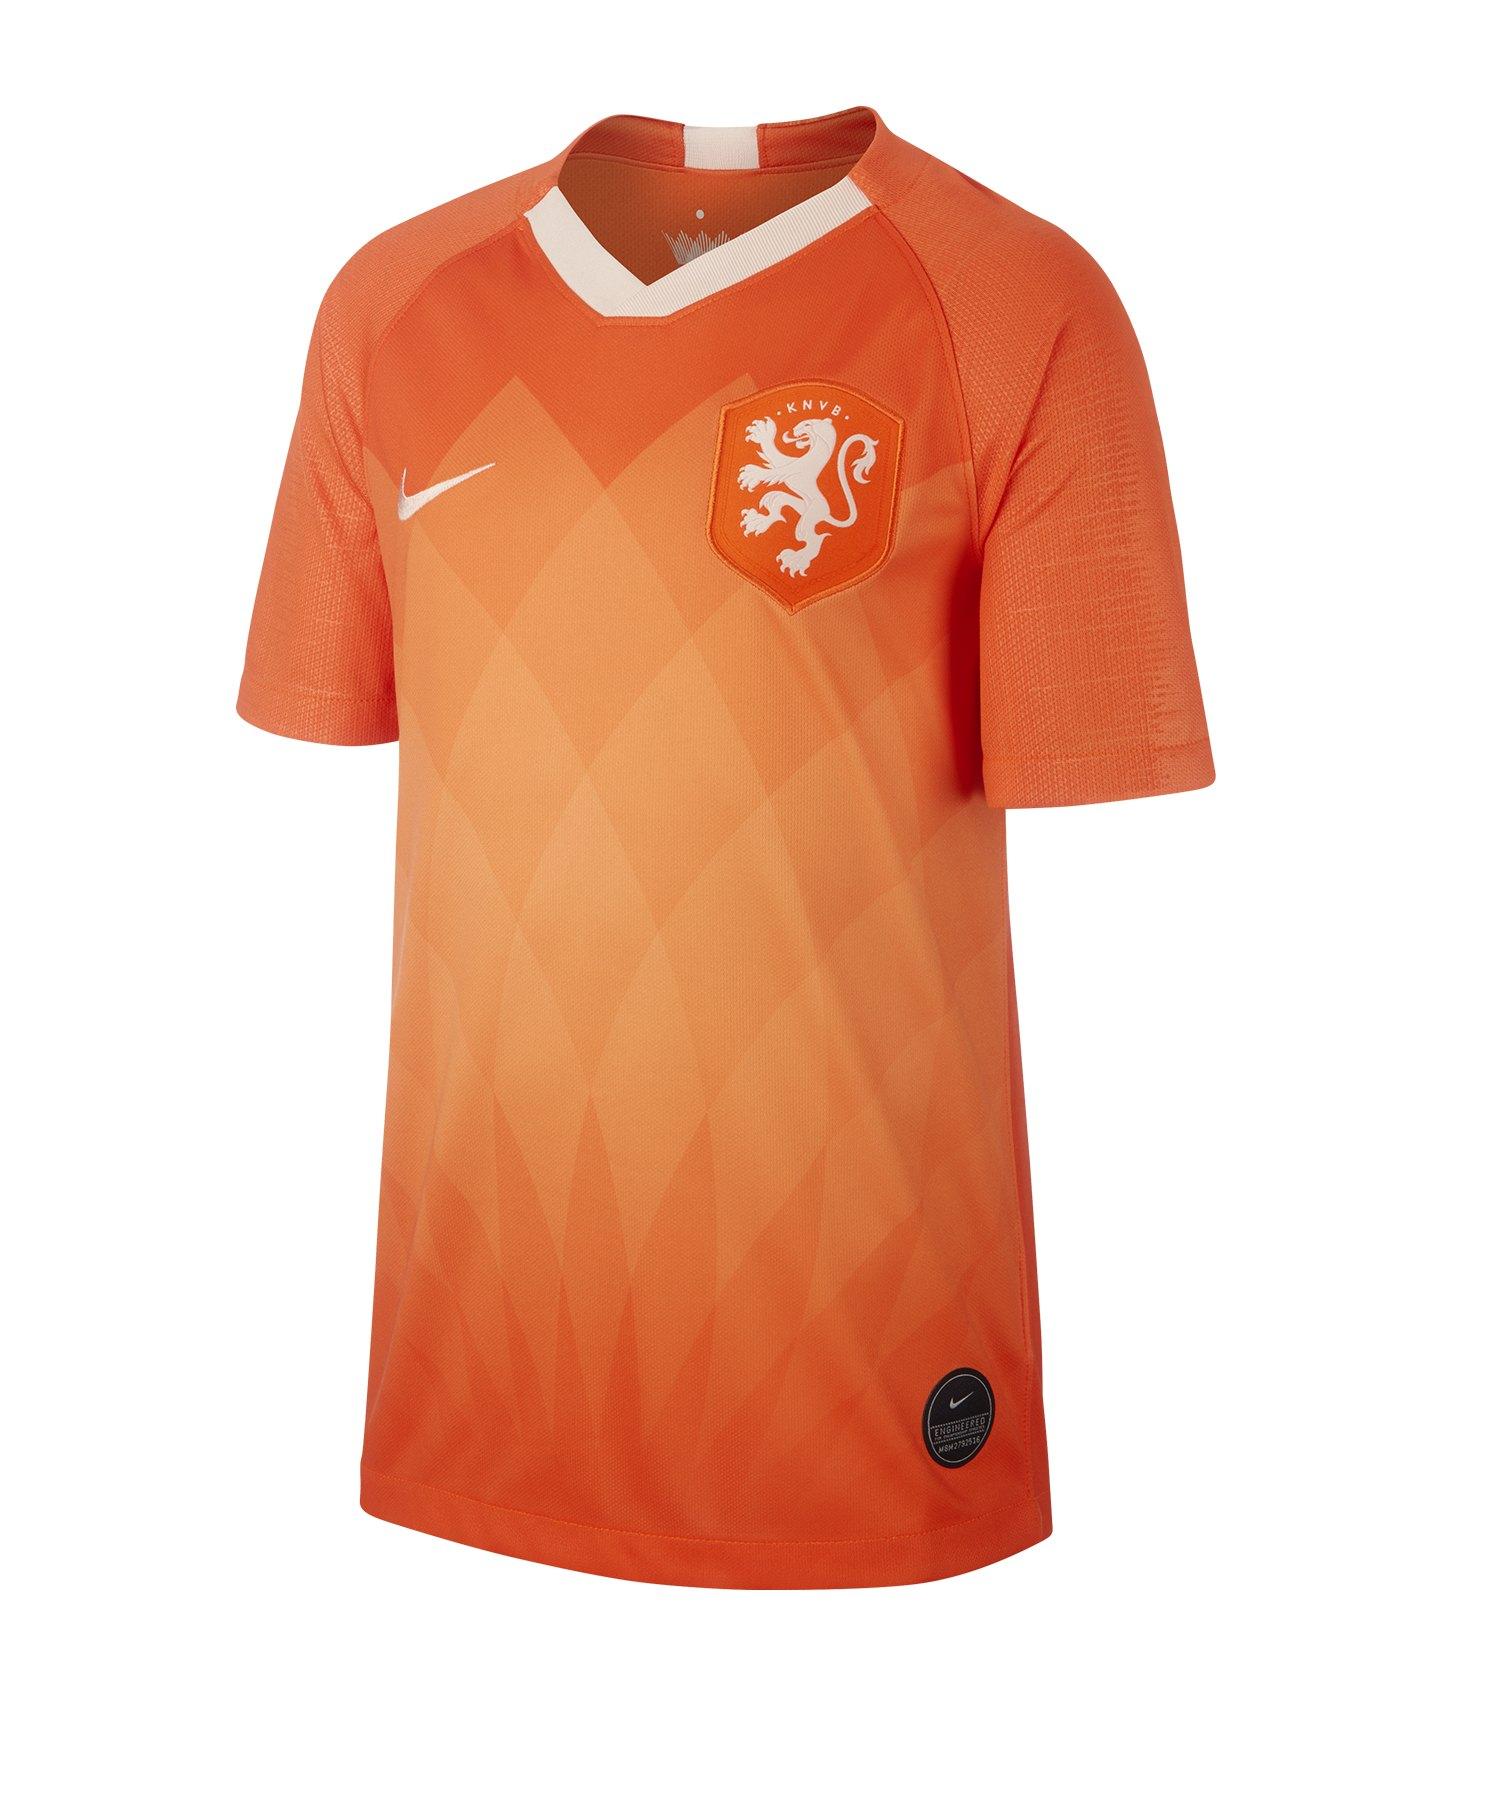 Nike Niederlande Trikot Home Kids 2019 Orange F819 - Orange